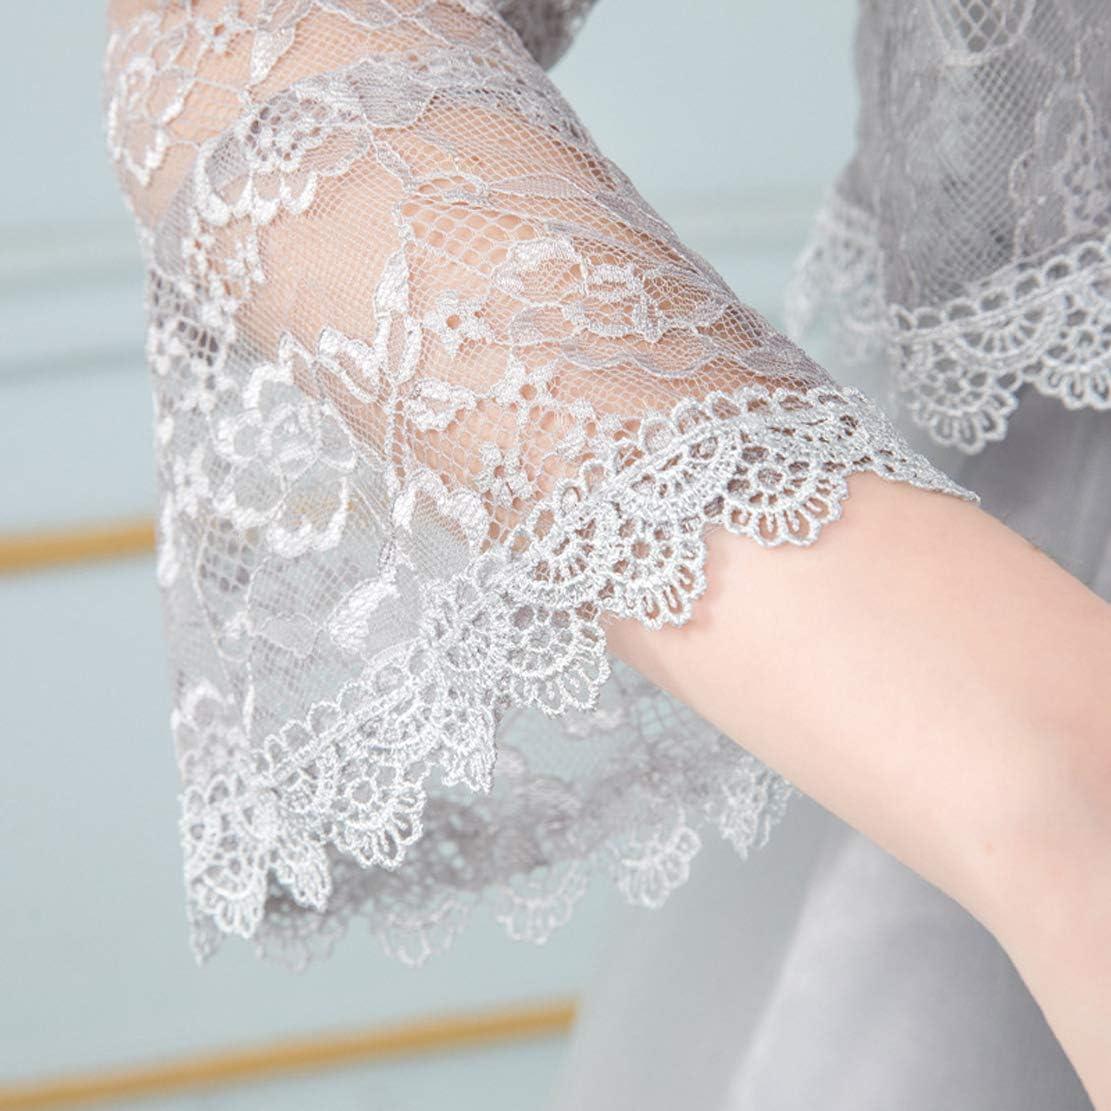 Elifemona Womens Fashion Lace Scarves Bolero for Evening Dresses Wrap Cape Shawl